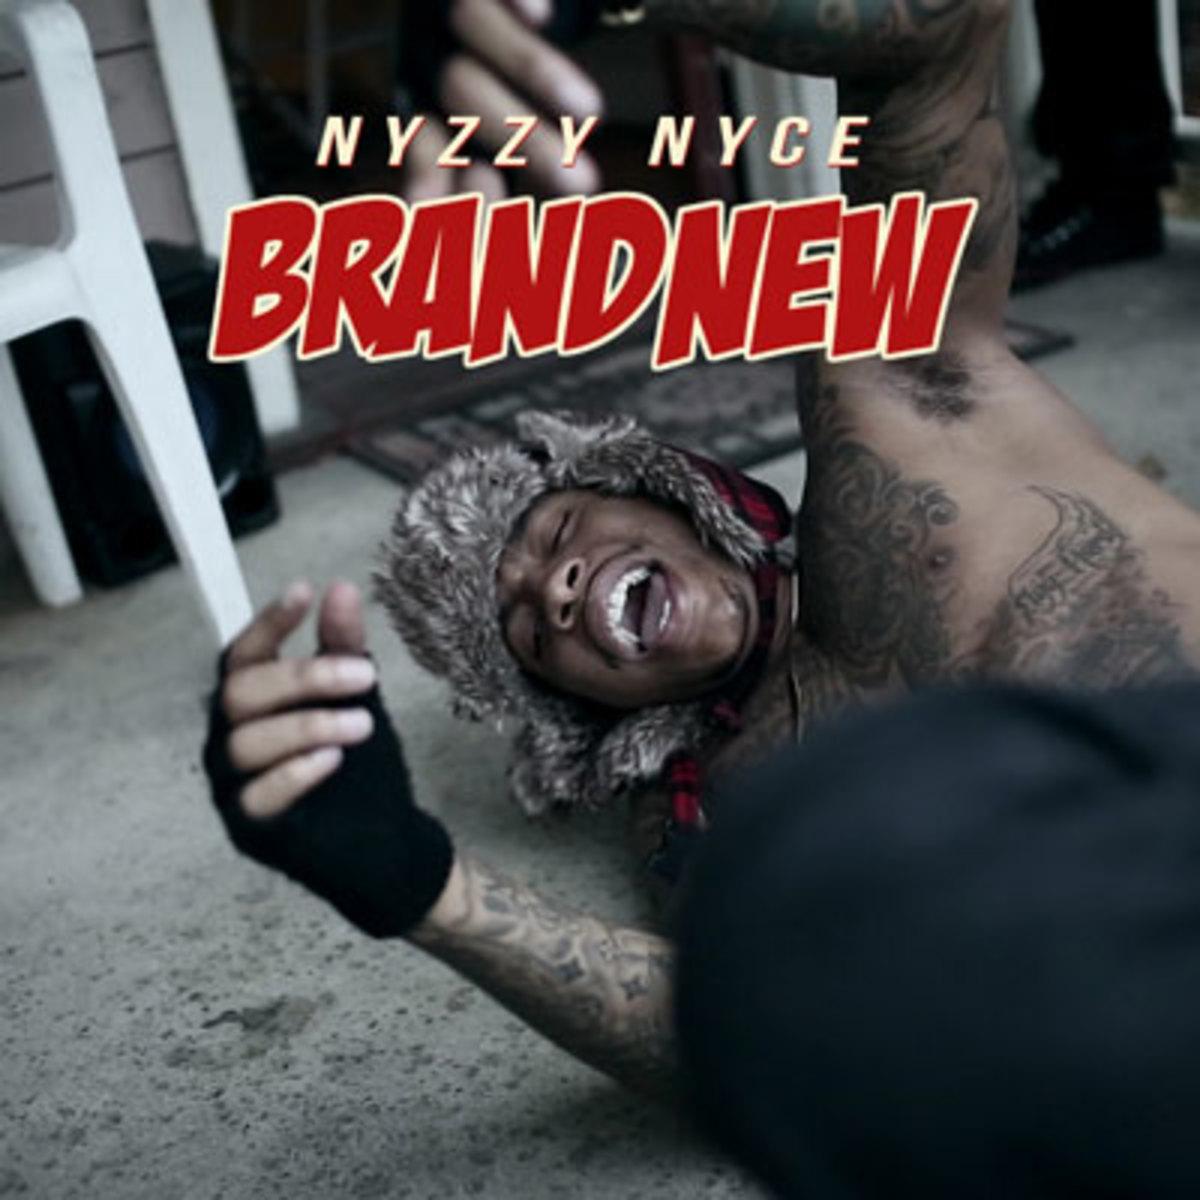 nyzzynyce-brandnew.jpg